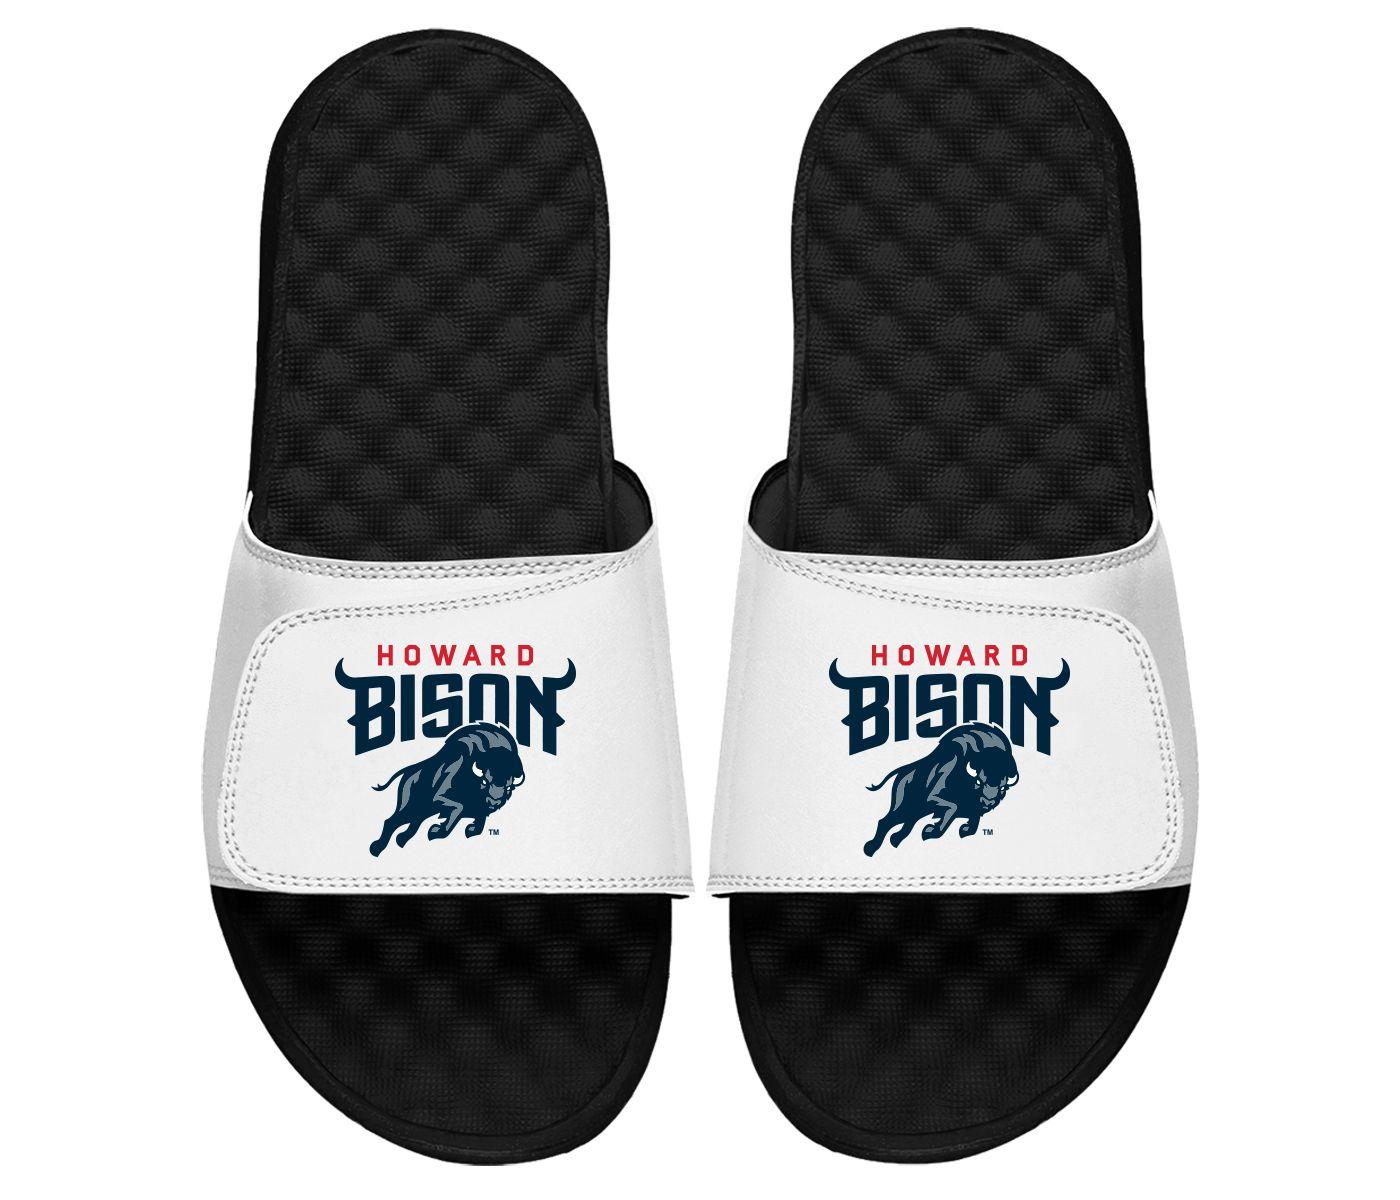 ISlide Howard Bison Youth Sandals